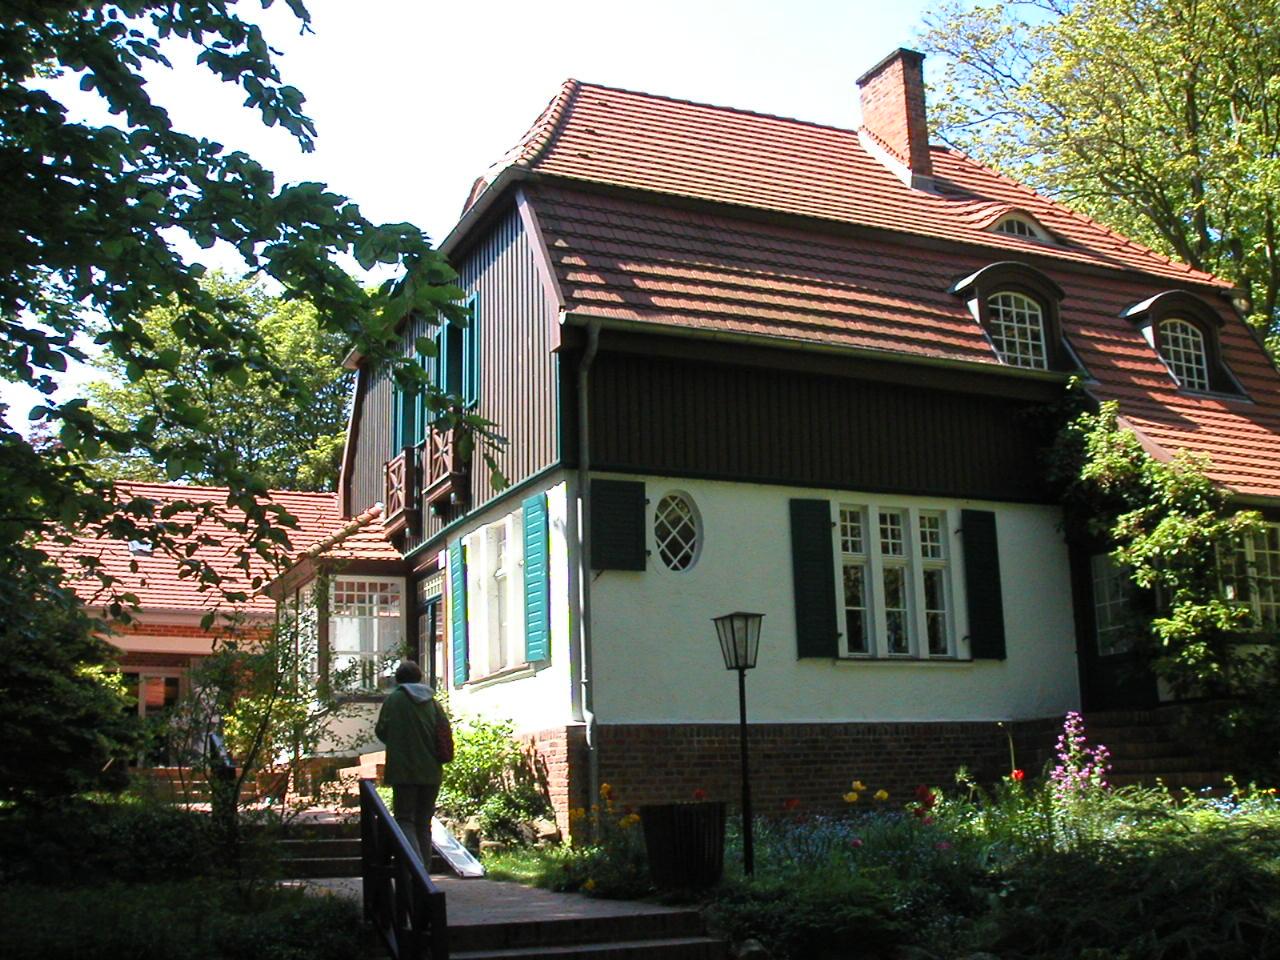 File Haus Seedorn auf Hiddensee Wikimedia mons